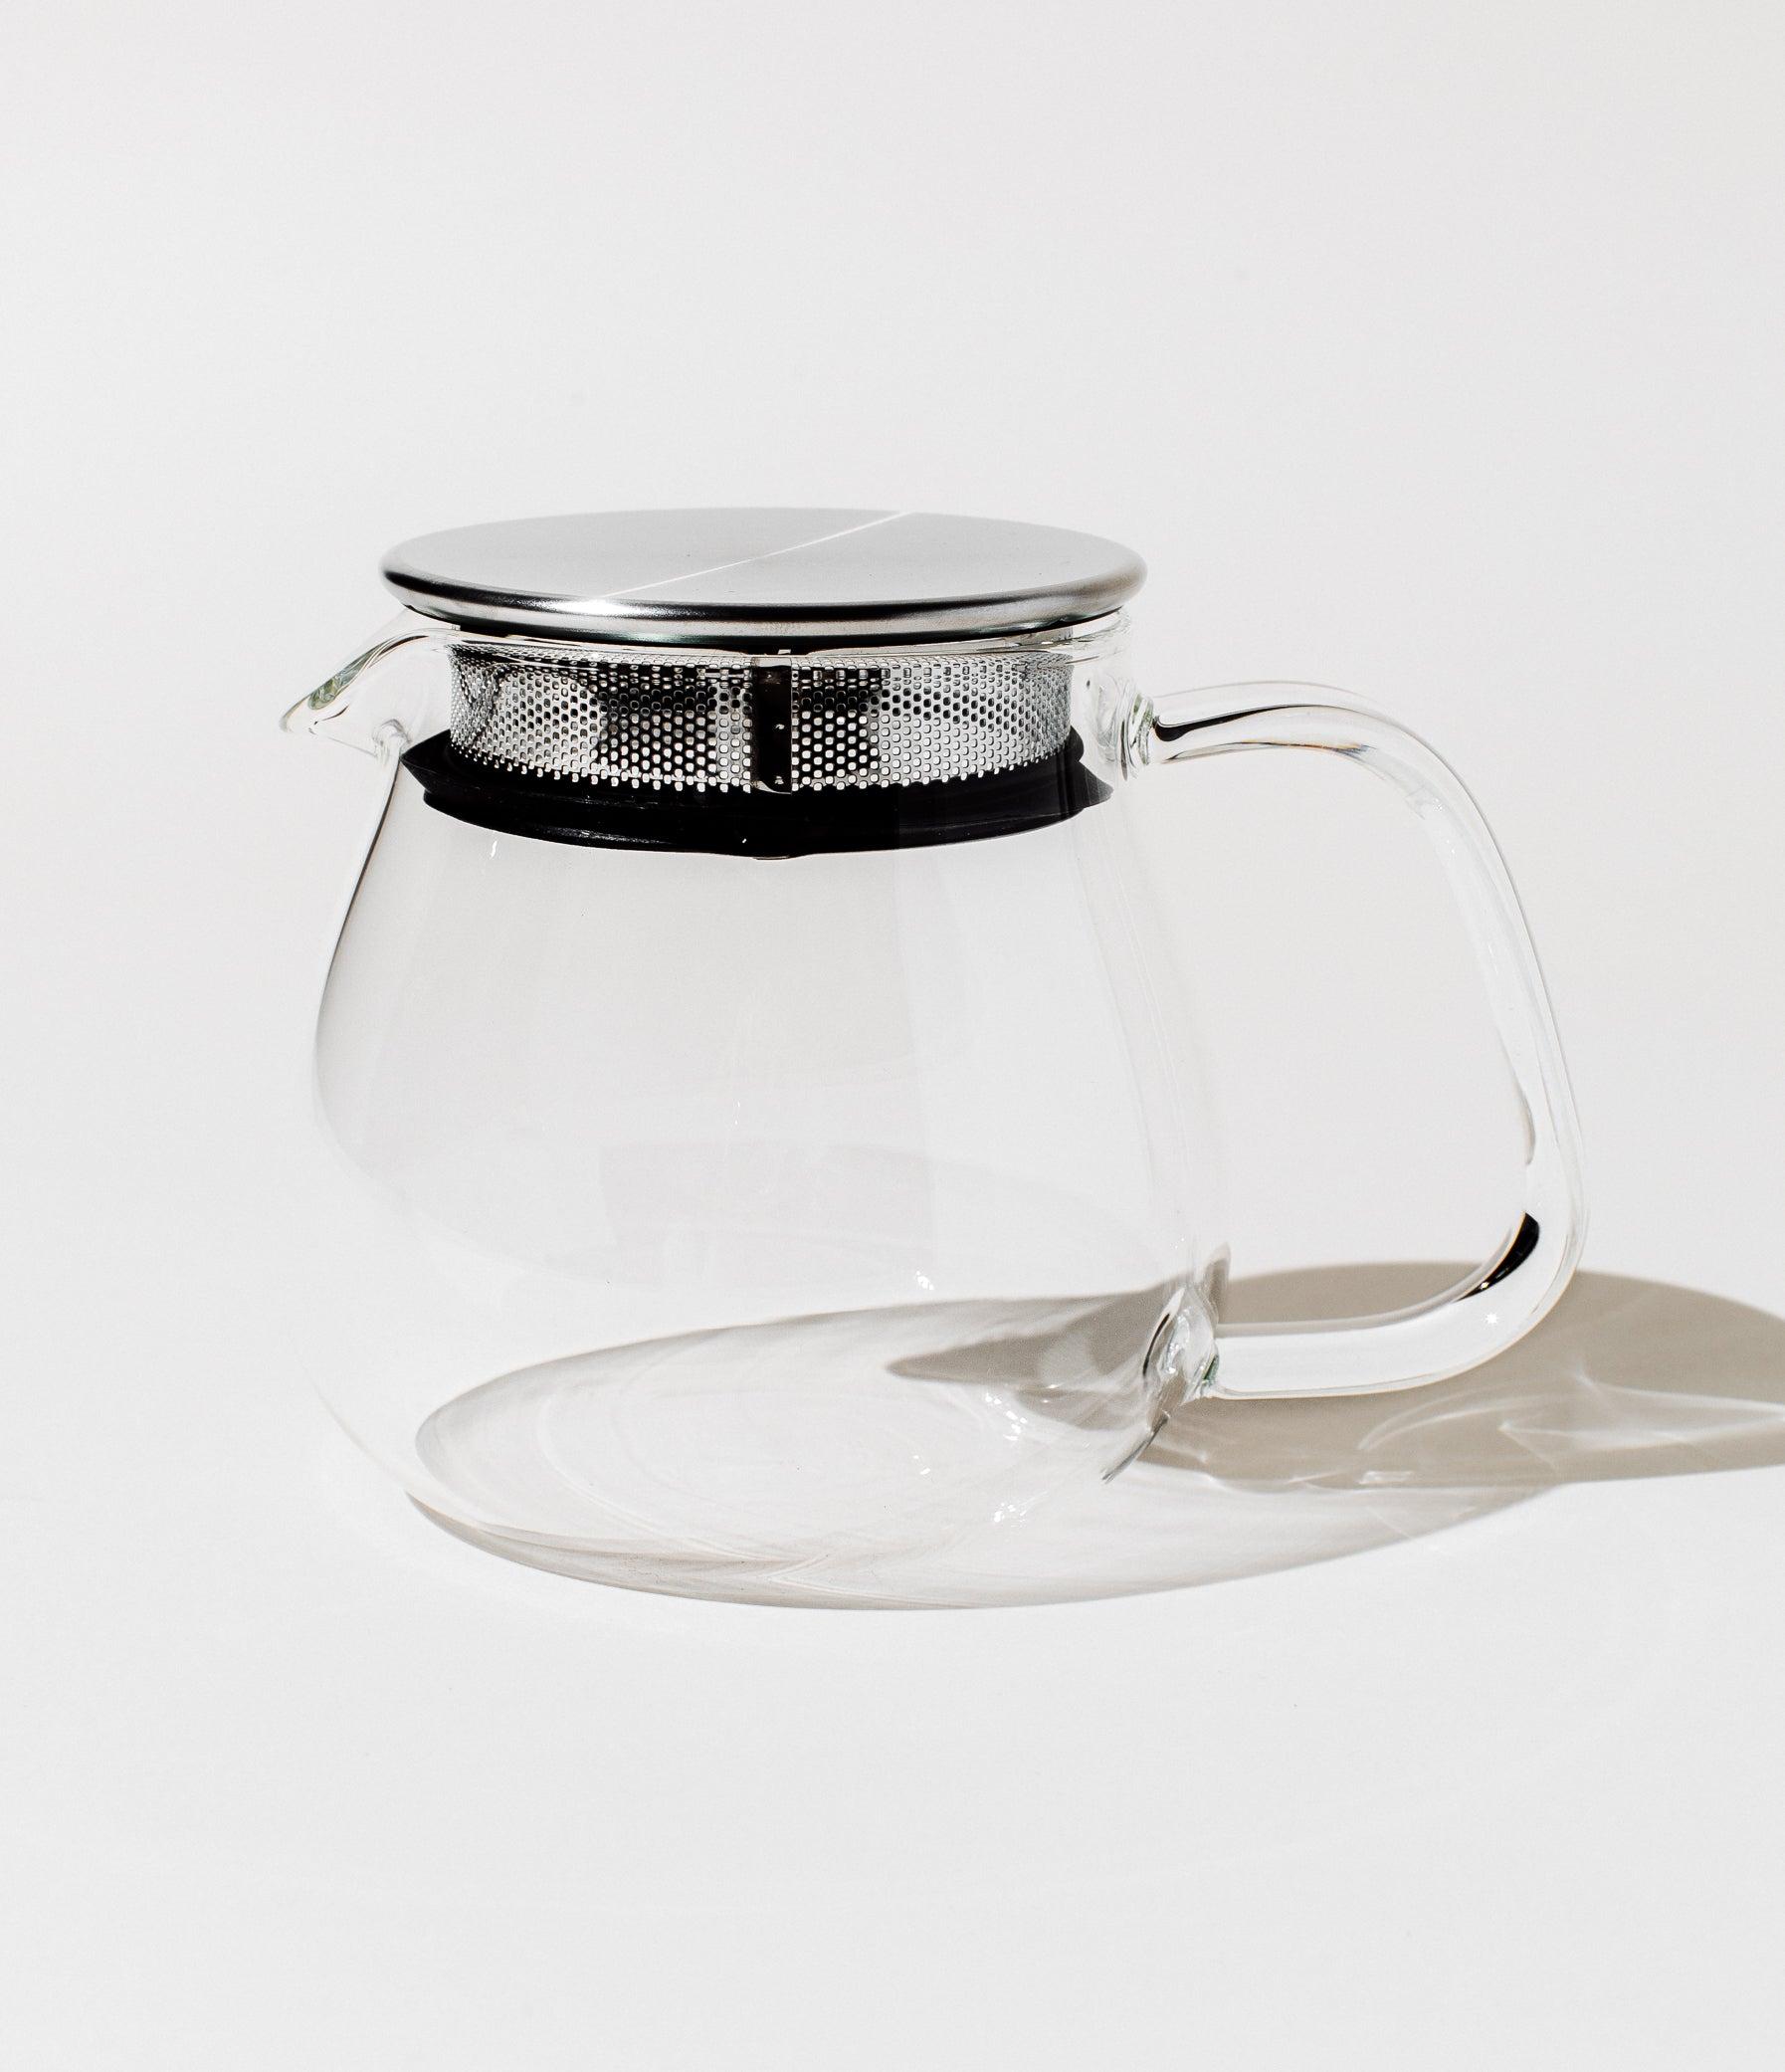 Kinto Glass Teapot Teaware 15 oz by Art of Tea